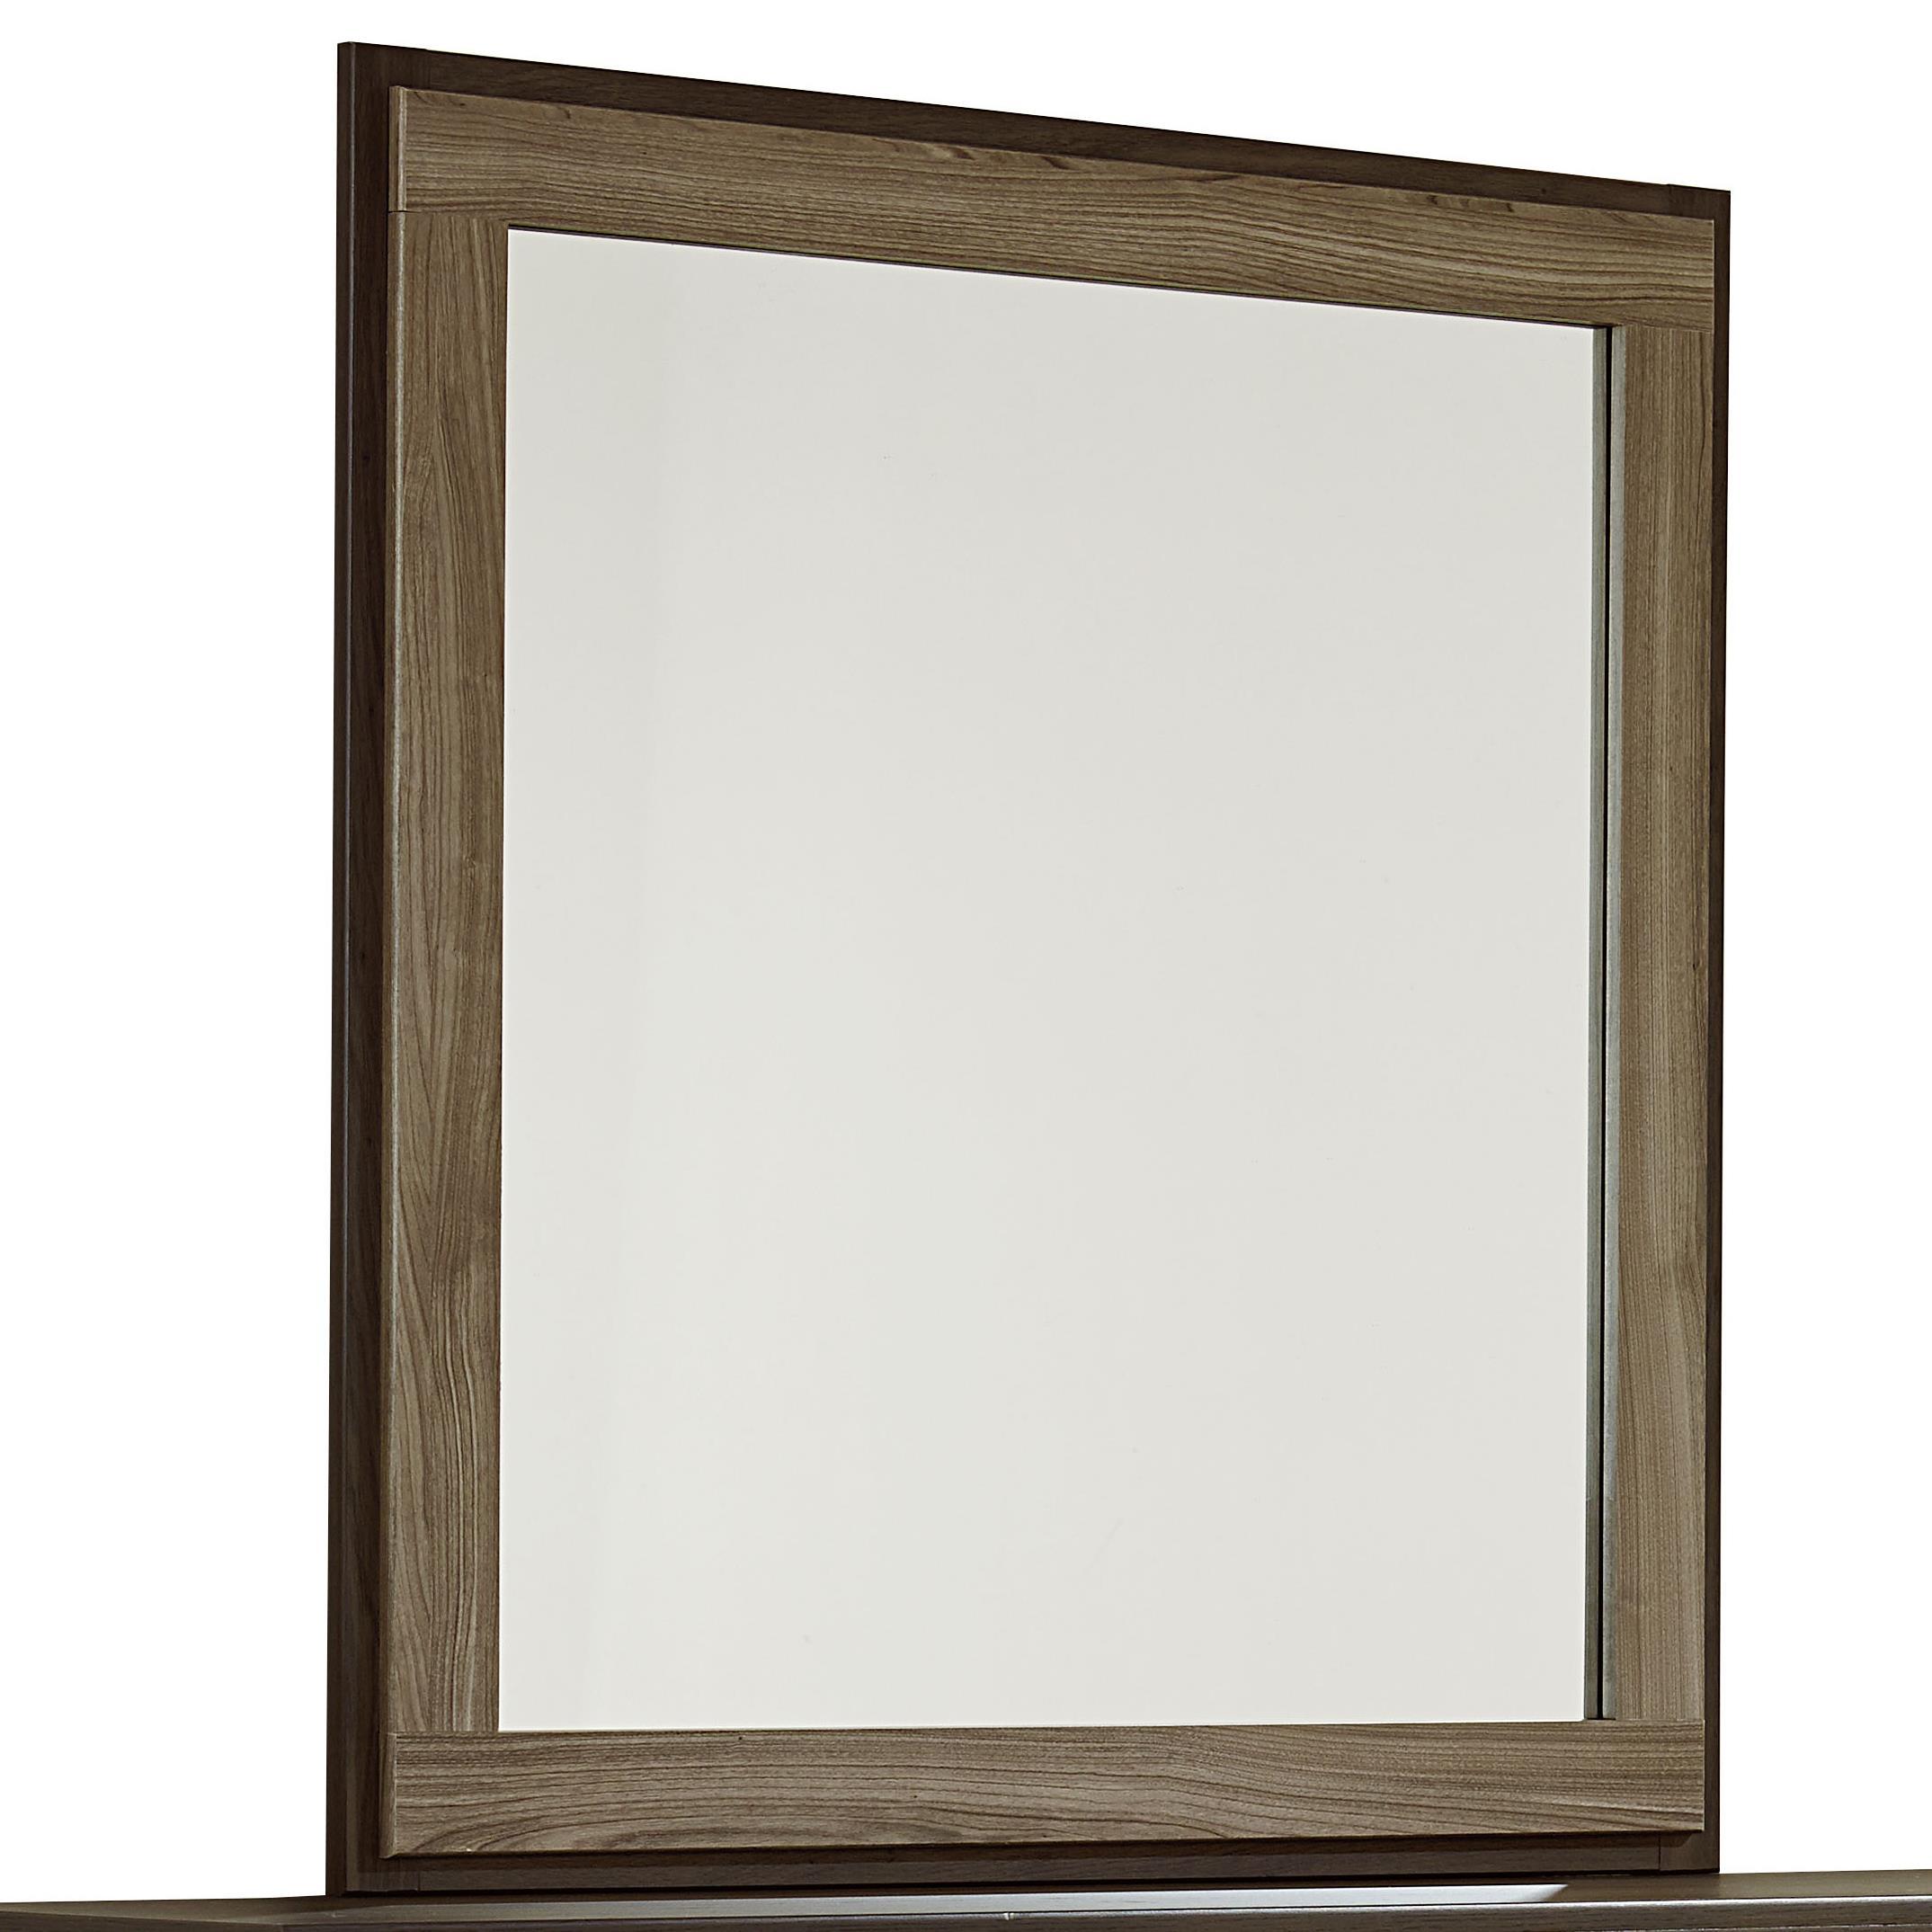 Standard Furniture Oakland Panel Mirror                         - Item Number: 69718